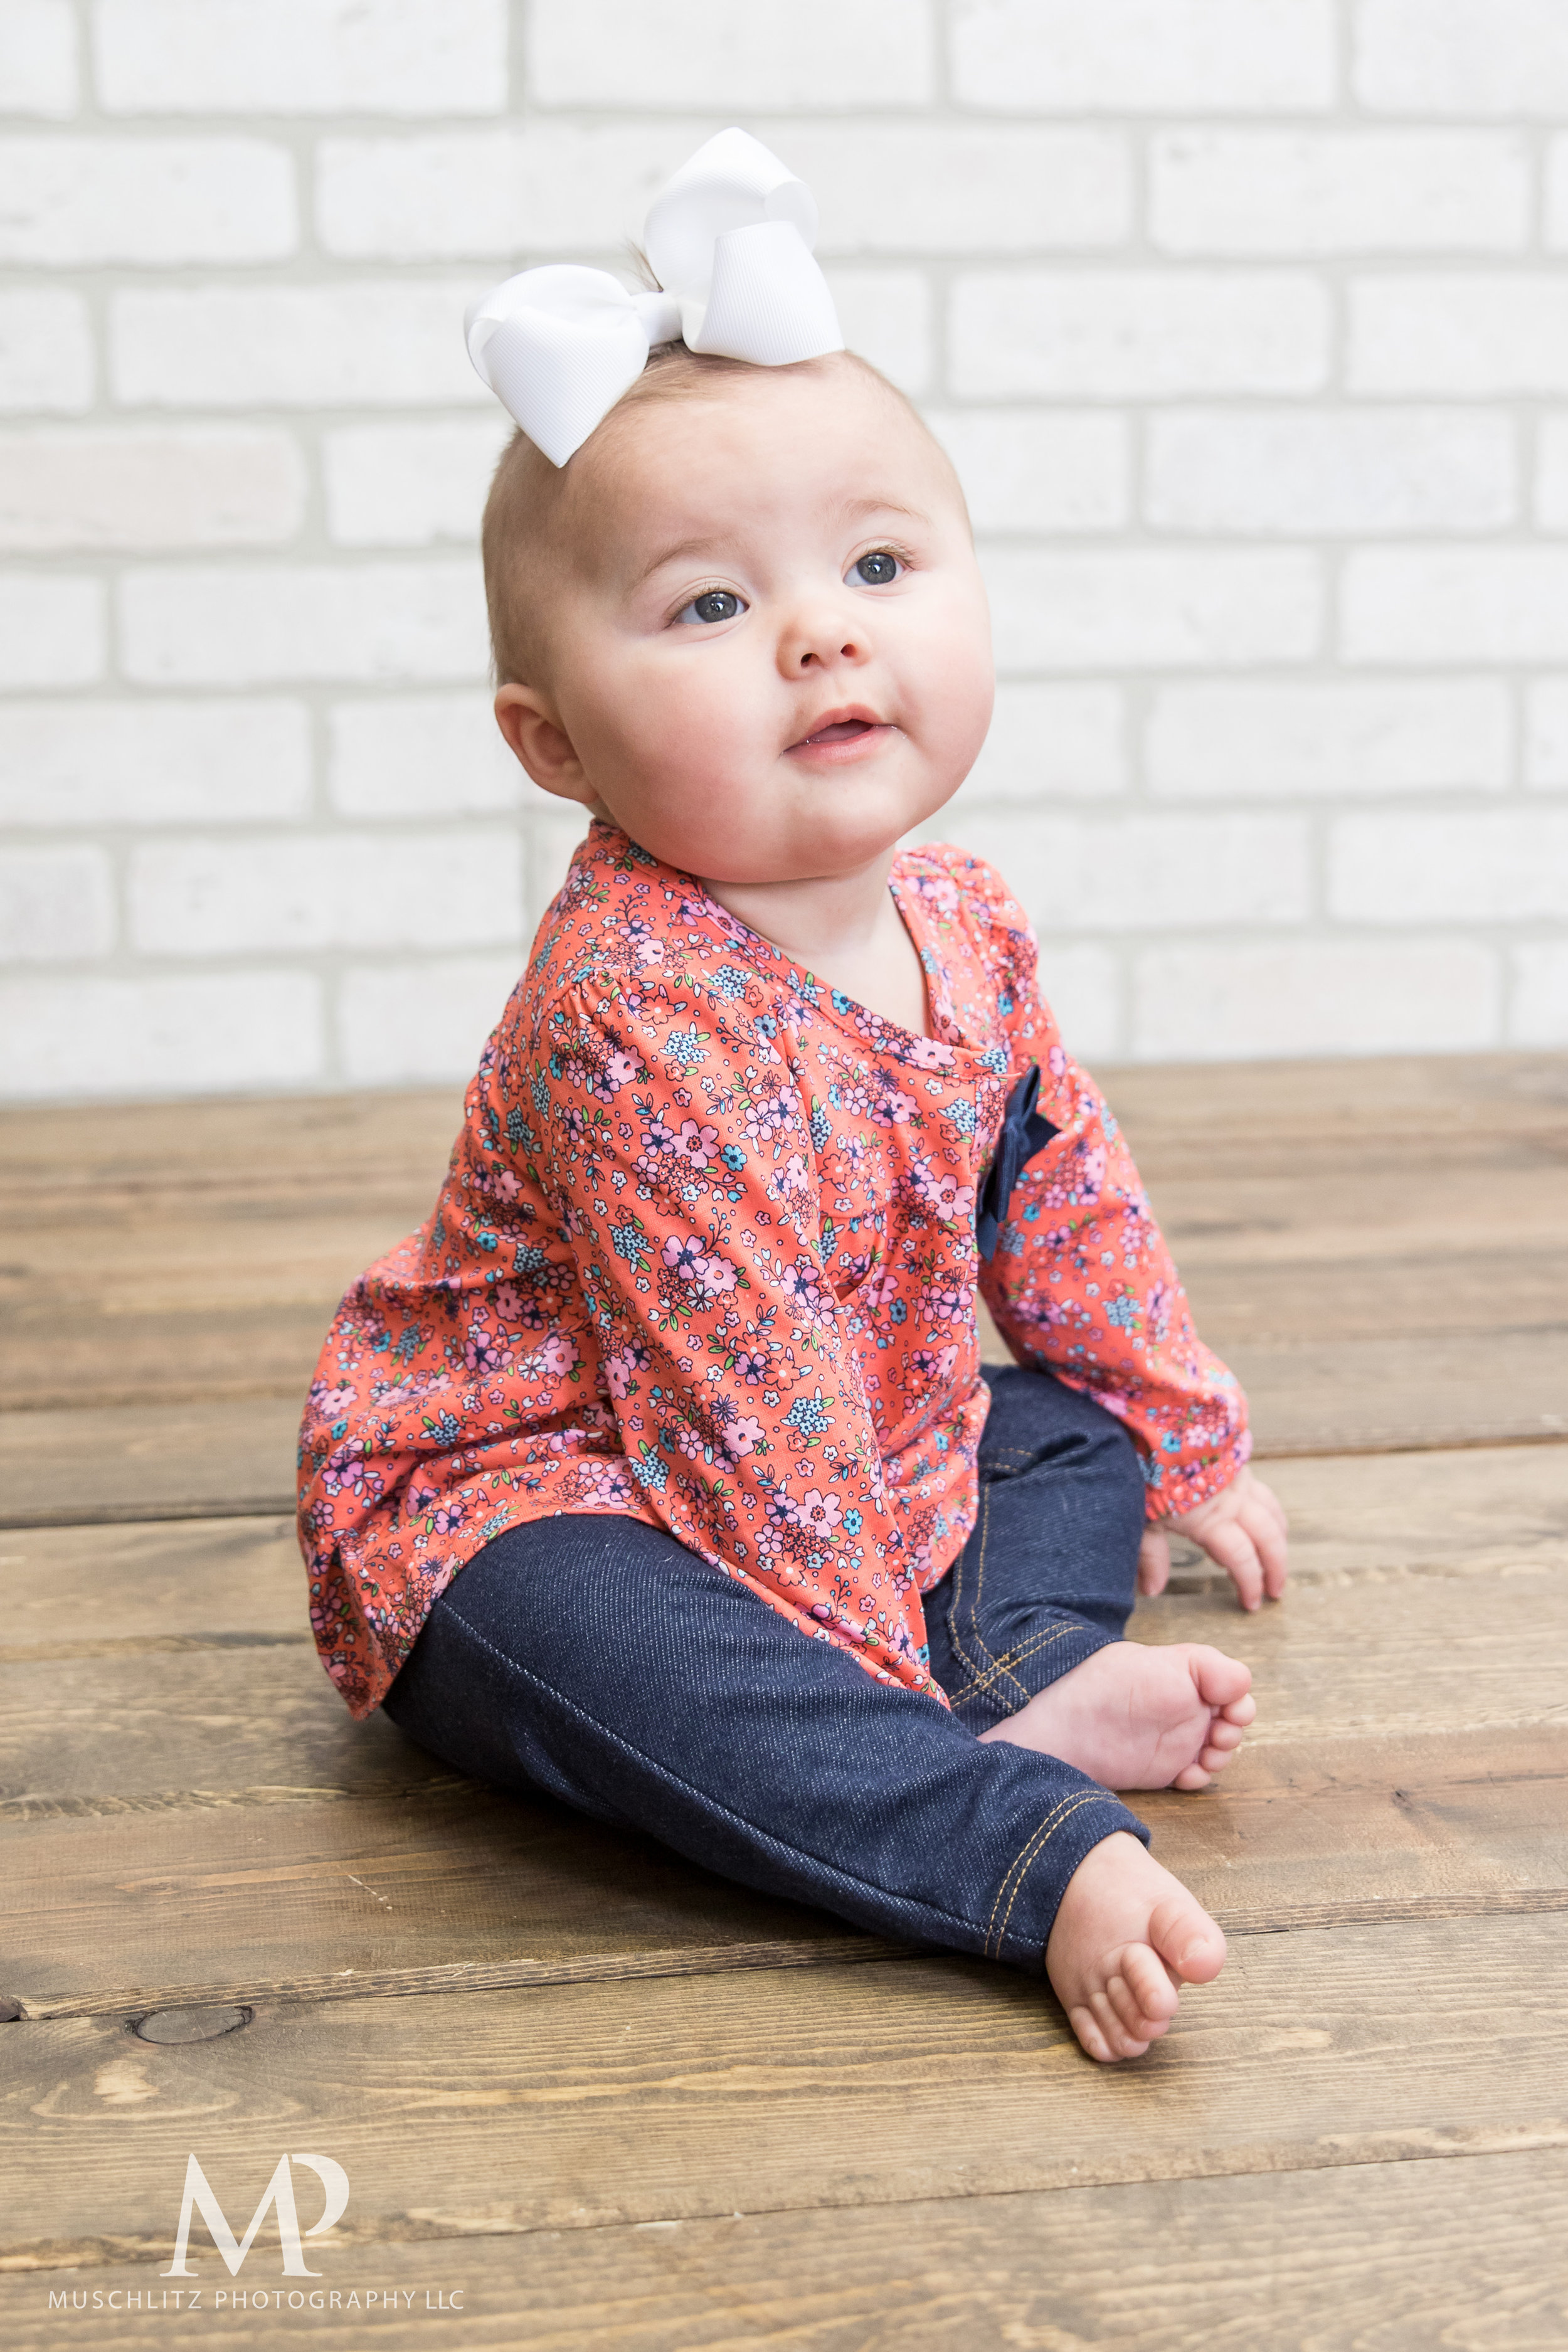 6-month-portraits-baby-photographer-columbus-ohio-gahanna-muschlitz-photography-002.JPG